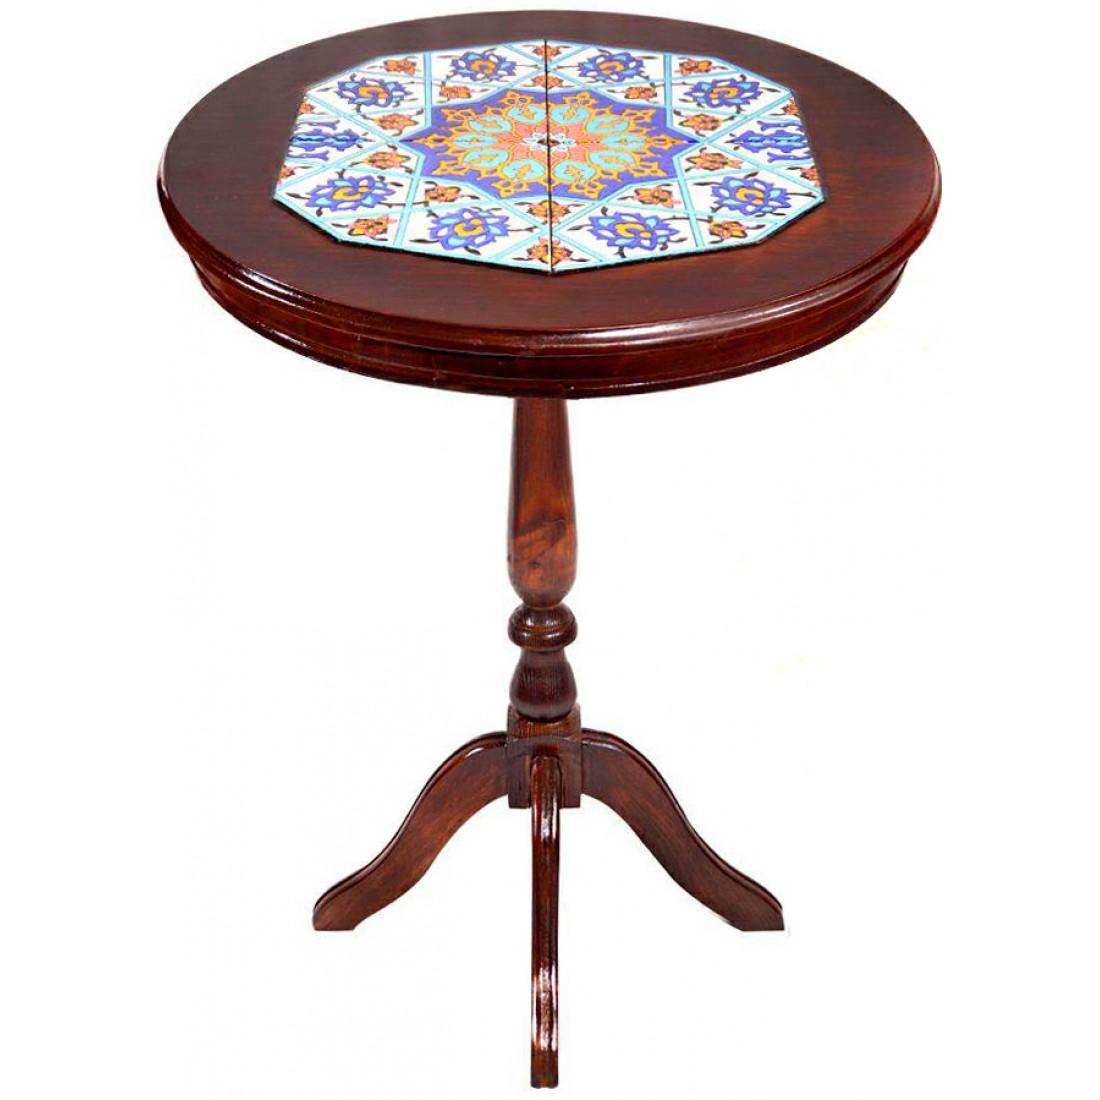 تزیین میز گرد کنار سالن قیمت میز گرد کنار سالن – سایت قیمت اجناس